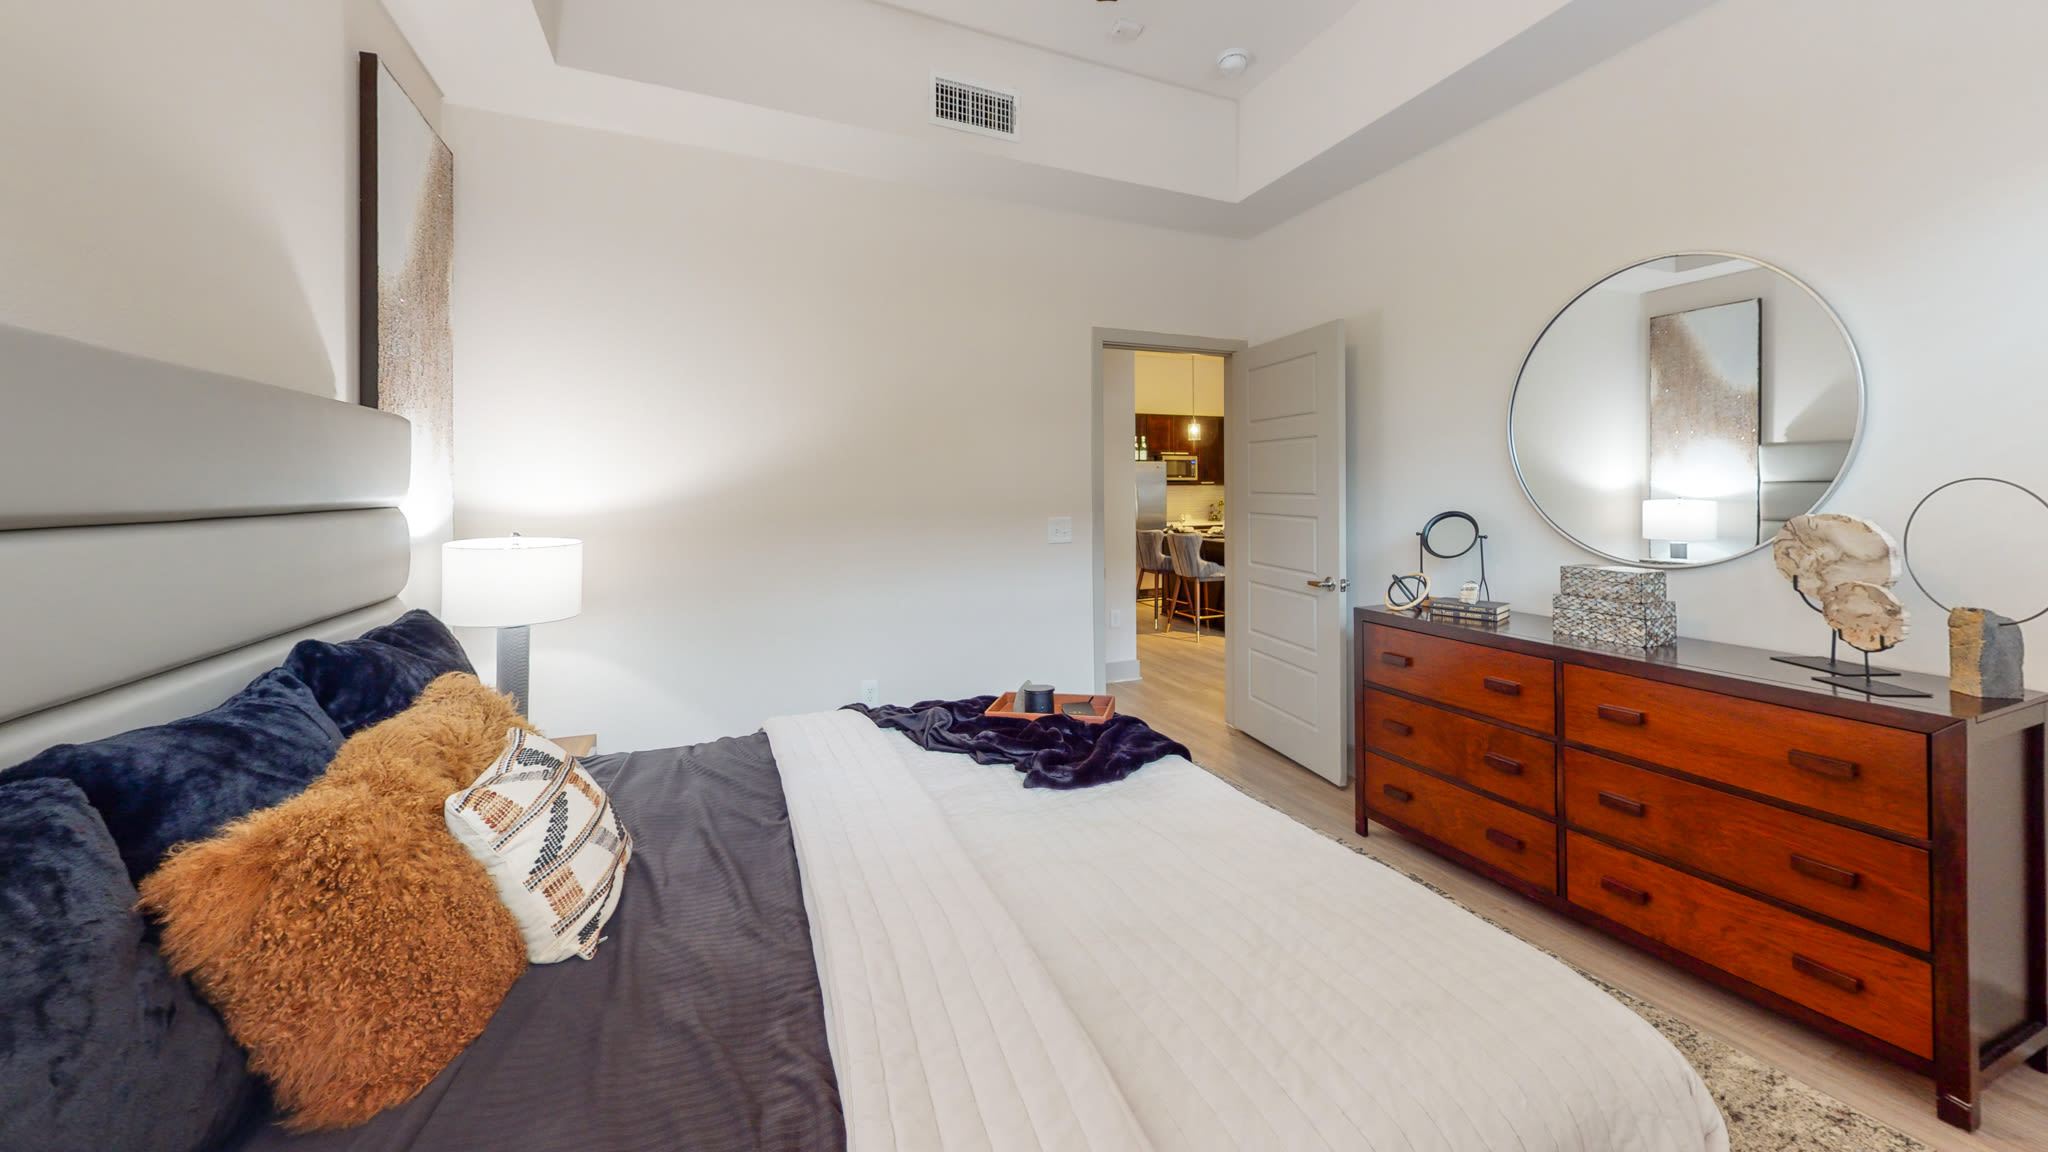 Comfortably furnished bedroom at Bellrock Bishop Arts in Dallas, Texas